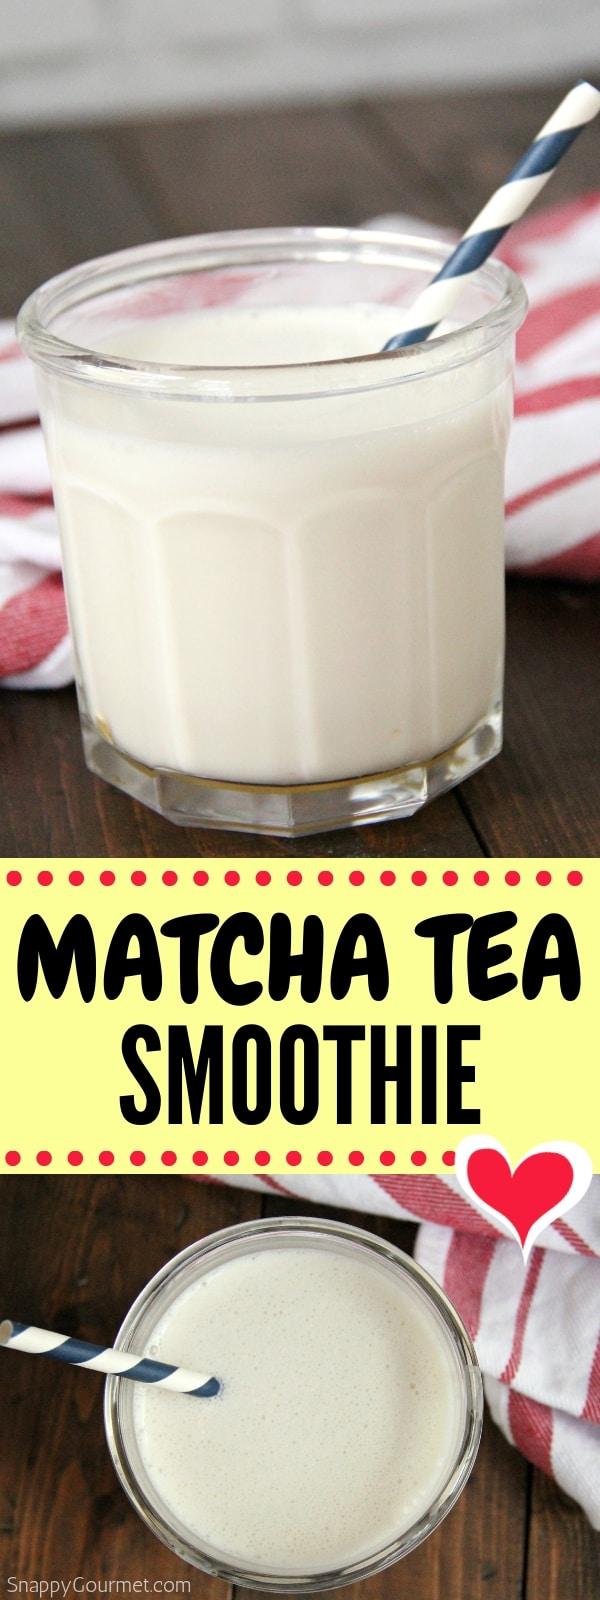 Matcha Smoothie photo collage